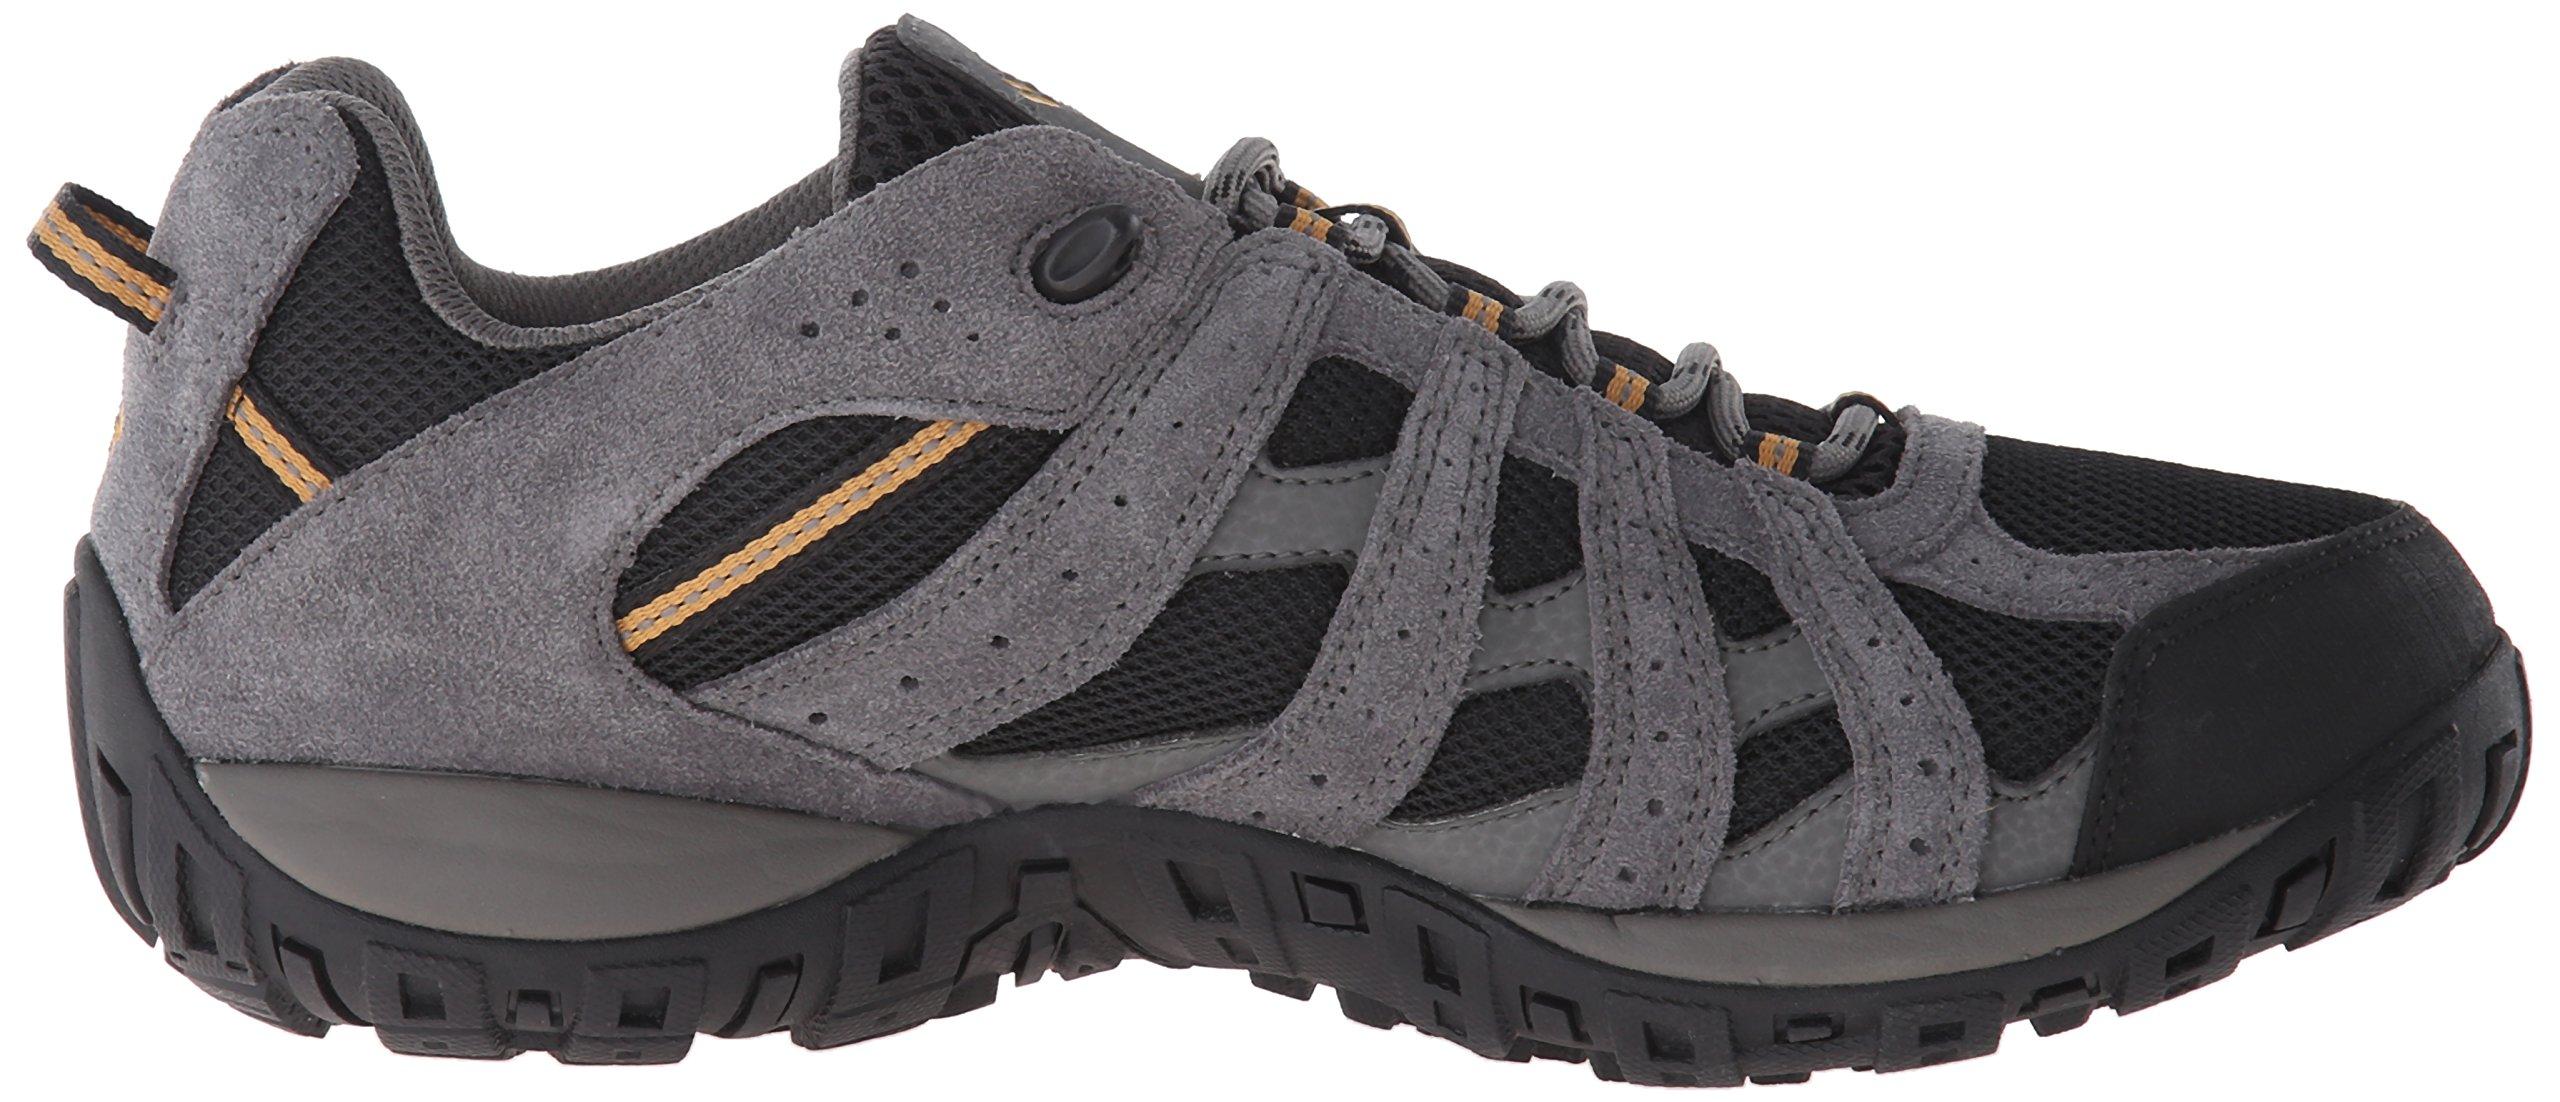 Columbia Men's Redmond Waterproof Hiking Shoe Black, Squash 7.5 D US by Columbia (Image #7)